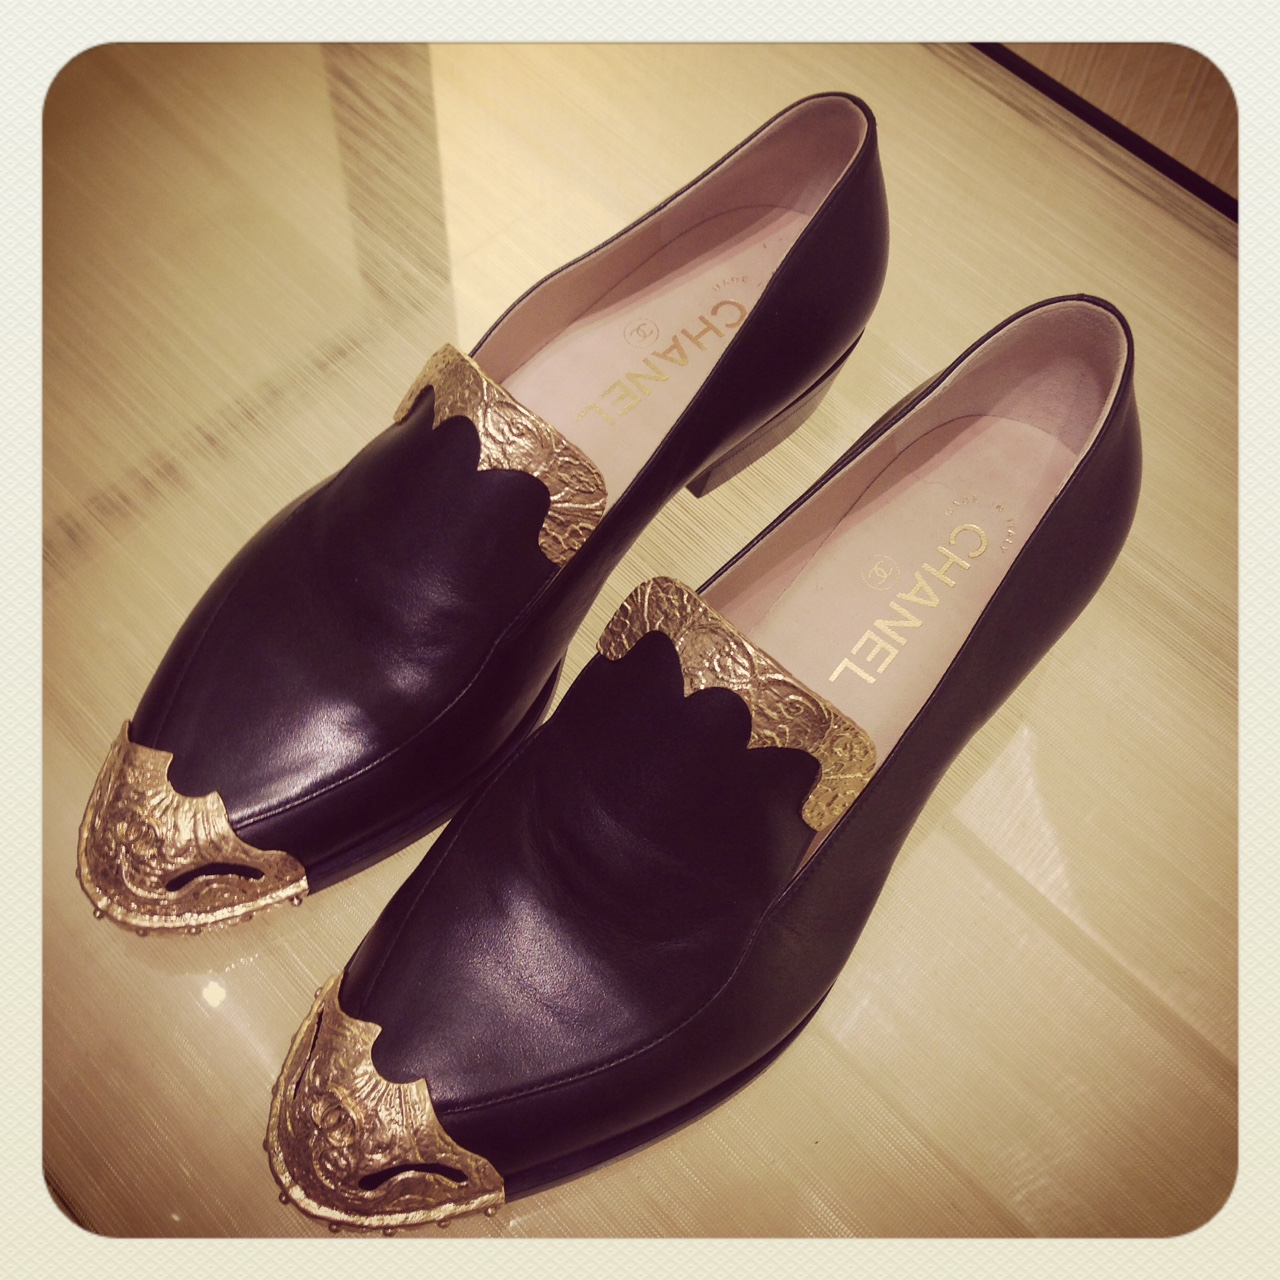 Shoes_insta.JPG